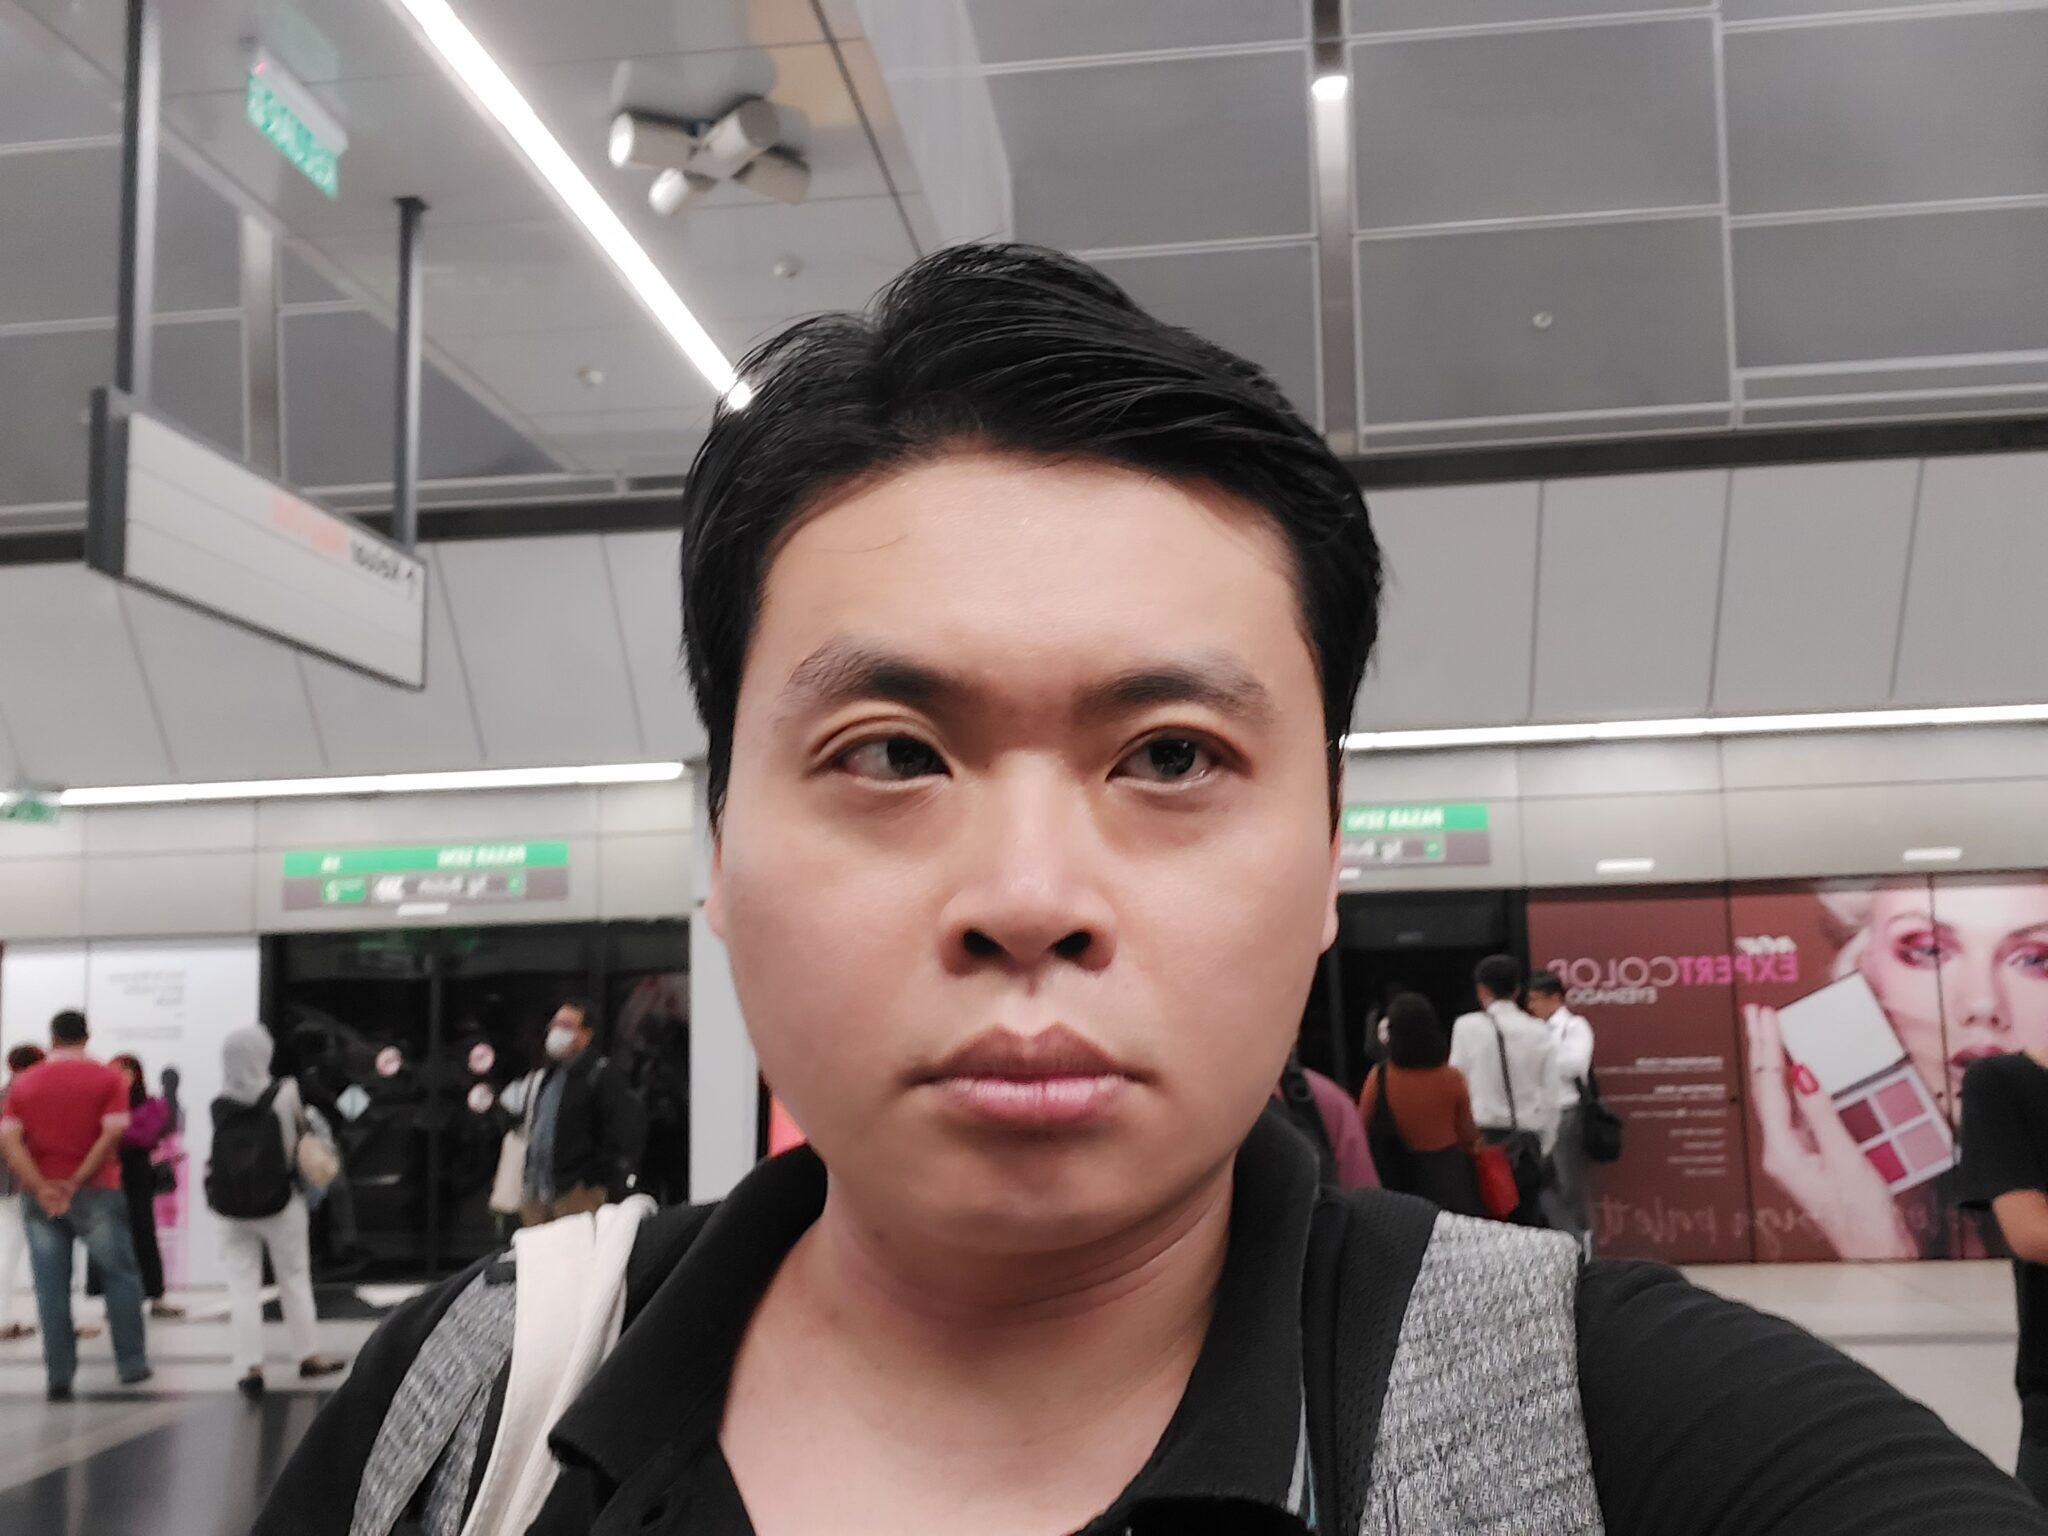 s10 lite 32-mp selfie